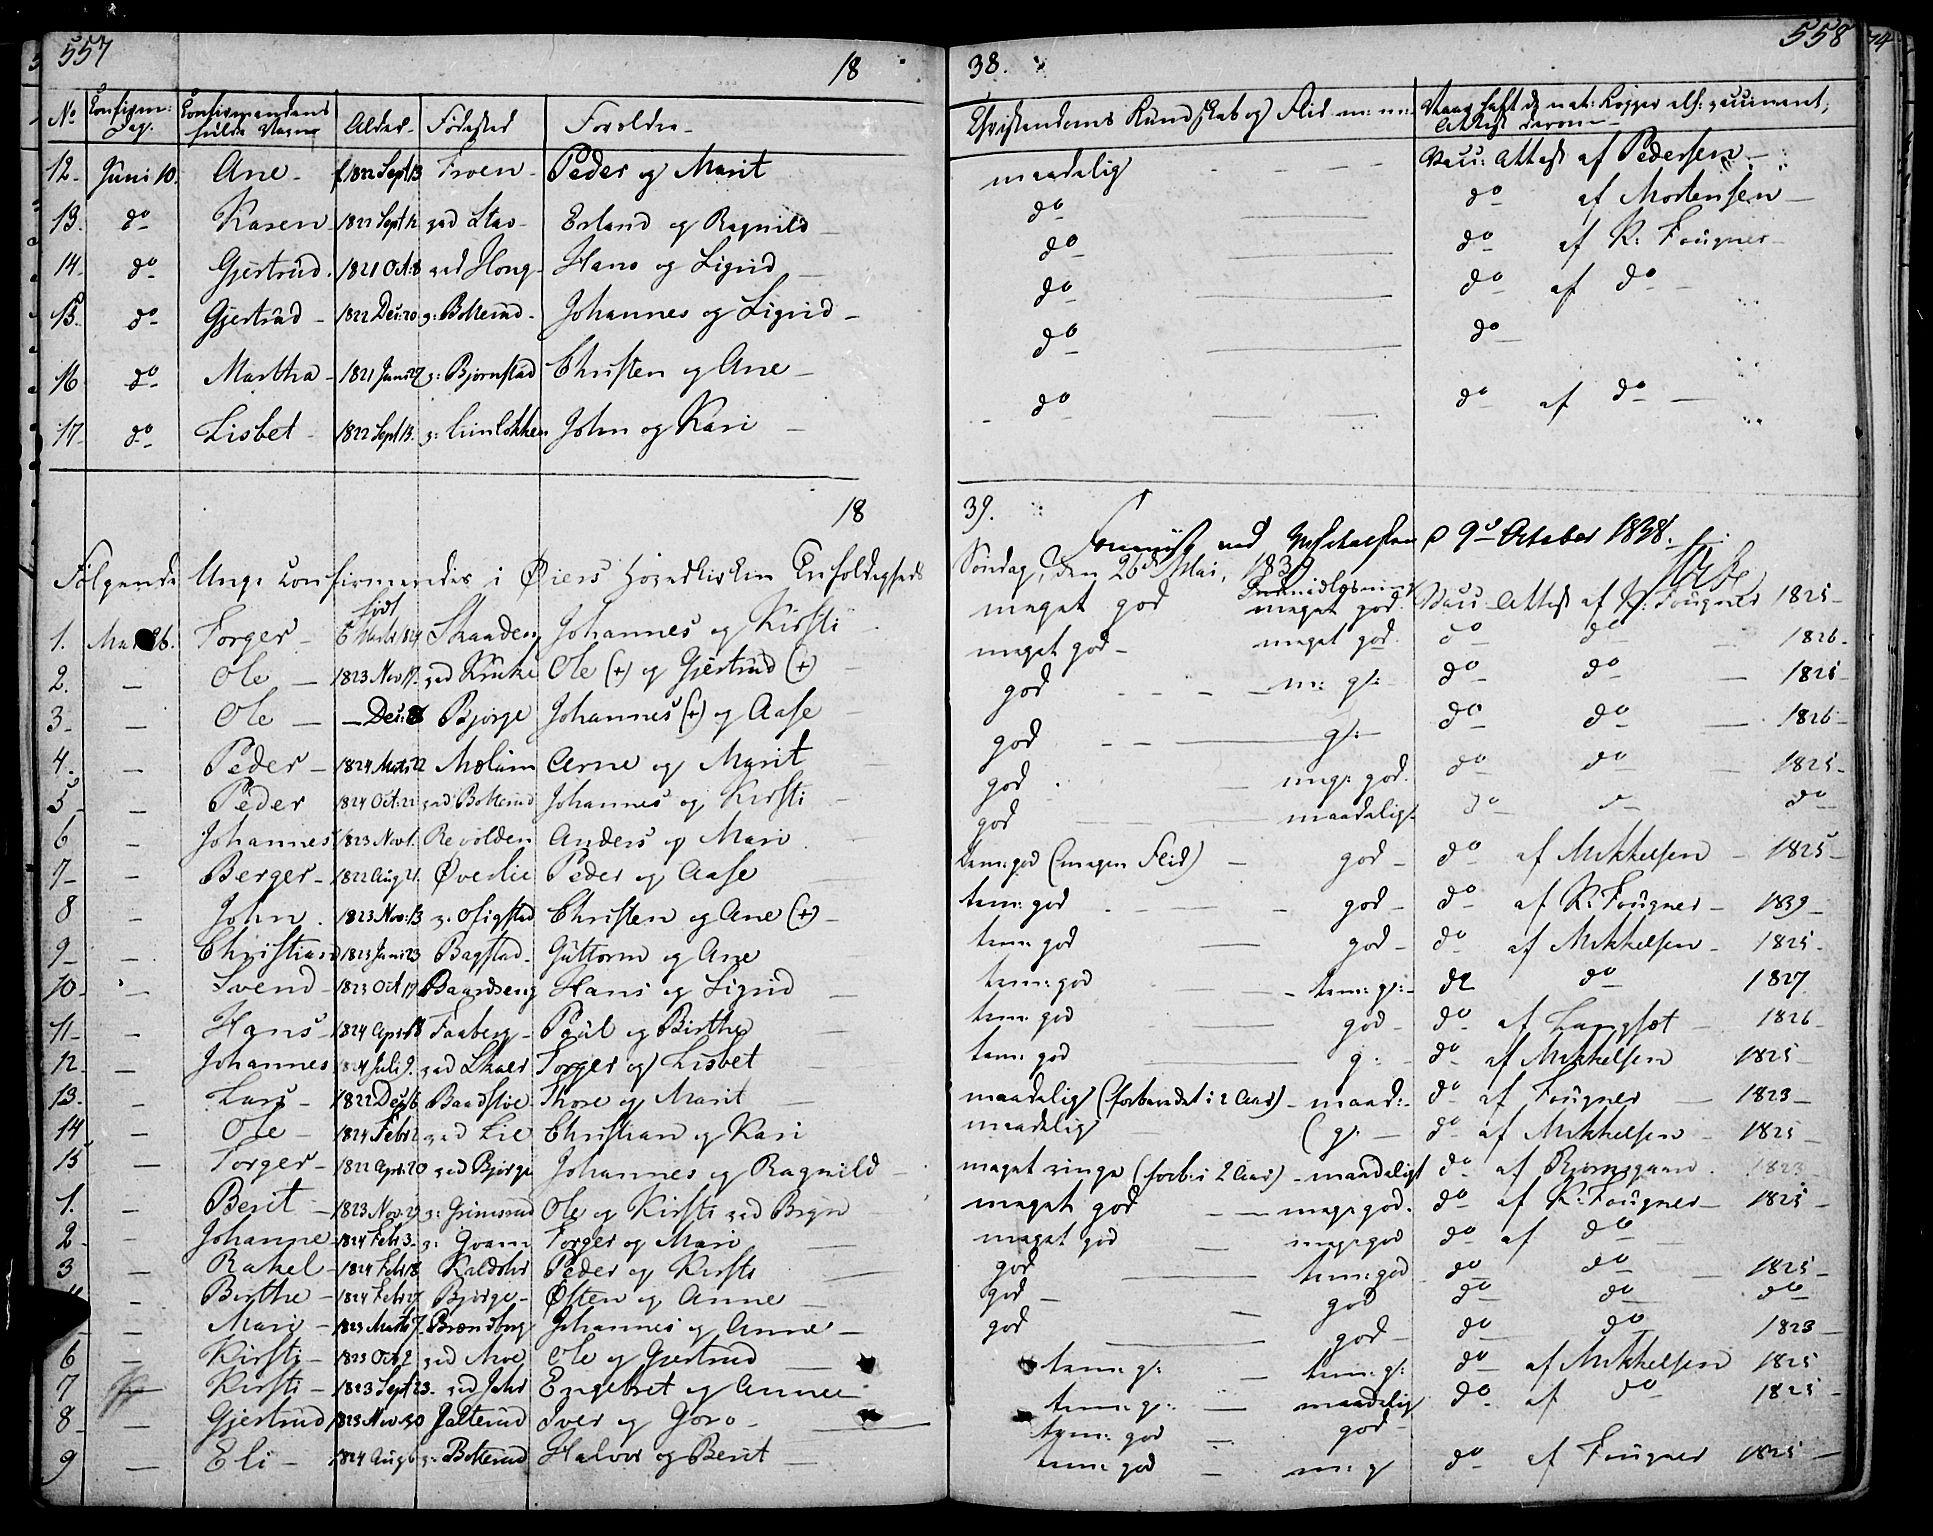 SAH, Øyer prestekontor, Ministerialbok nr. 4, 1824-1841, s. 557-558